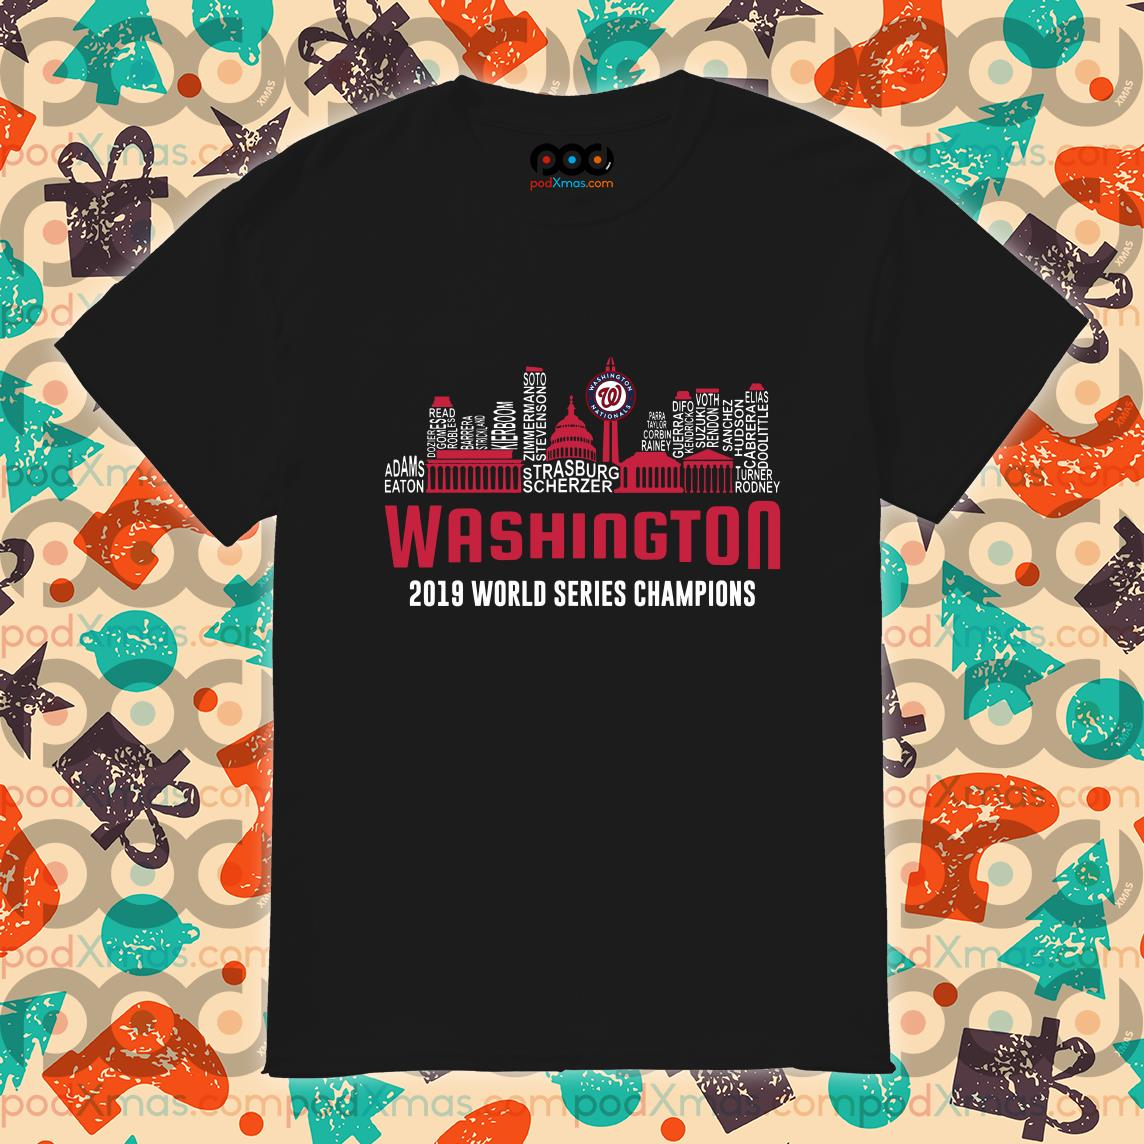 Washington 2019 world series Champions City shirt